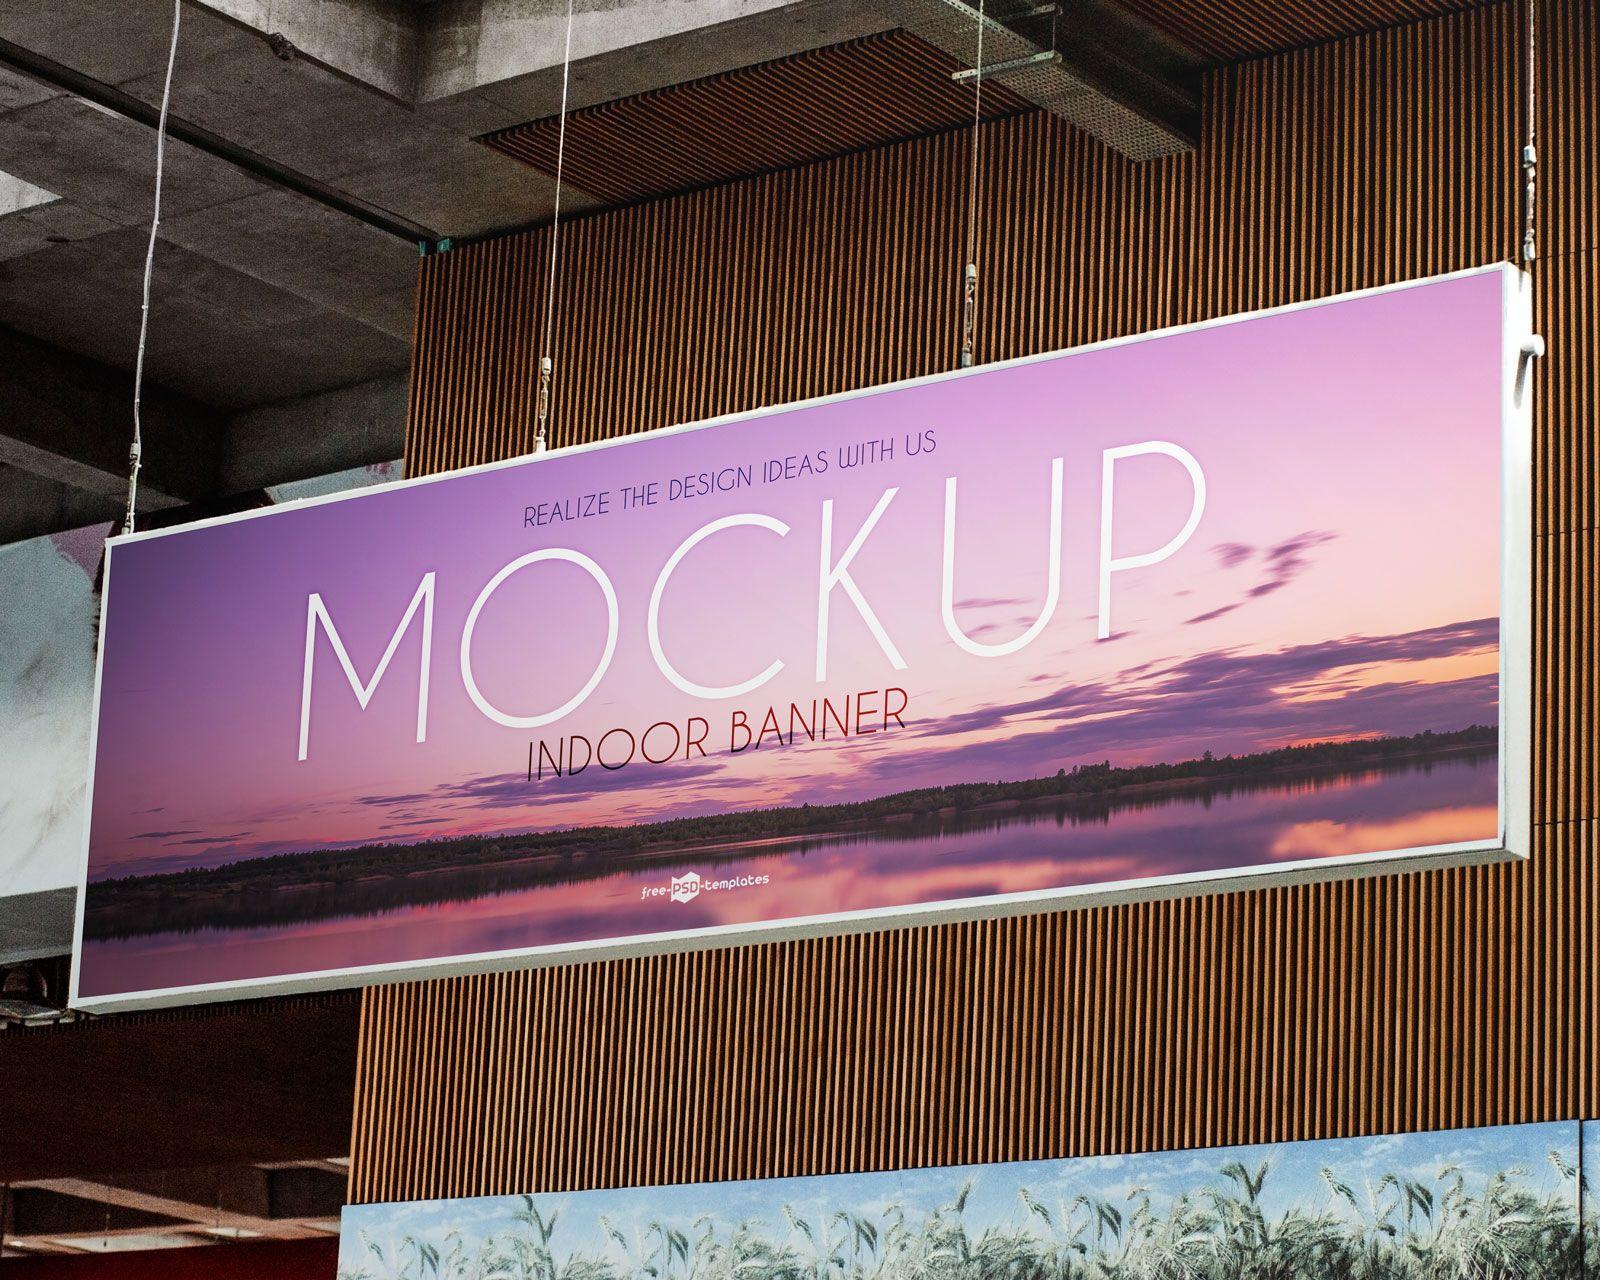 Free Indoor Advertising Banner Mockup Psd File Indoor Banner Banner Advertising Mockup Free Psd Download